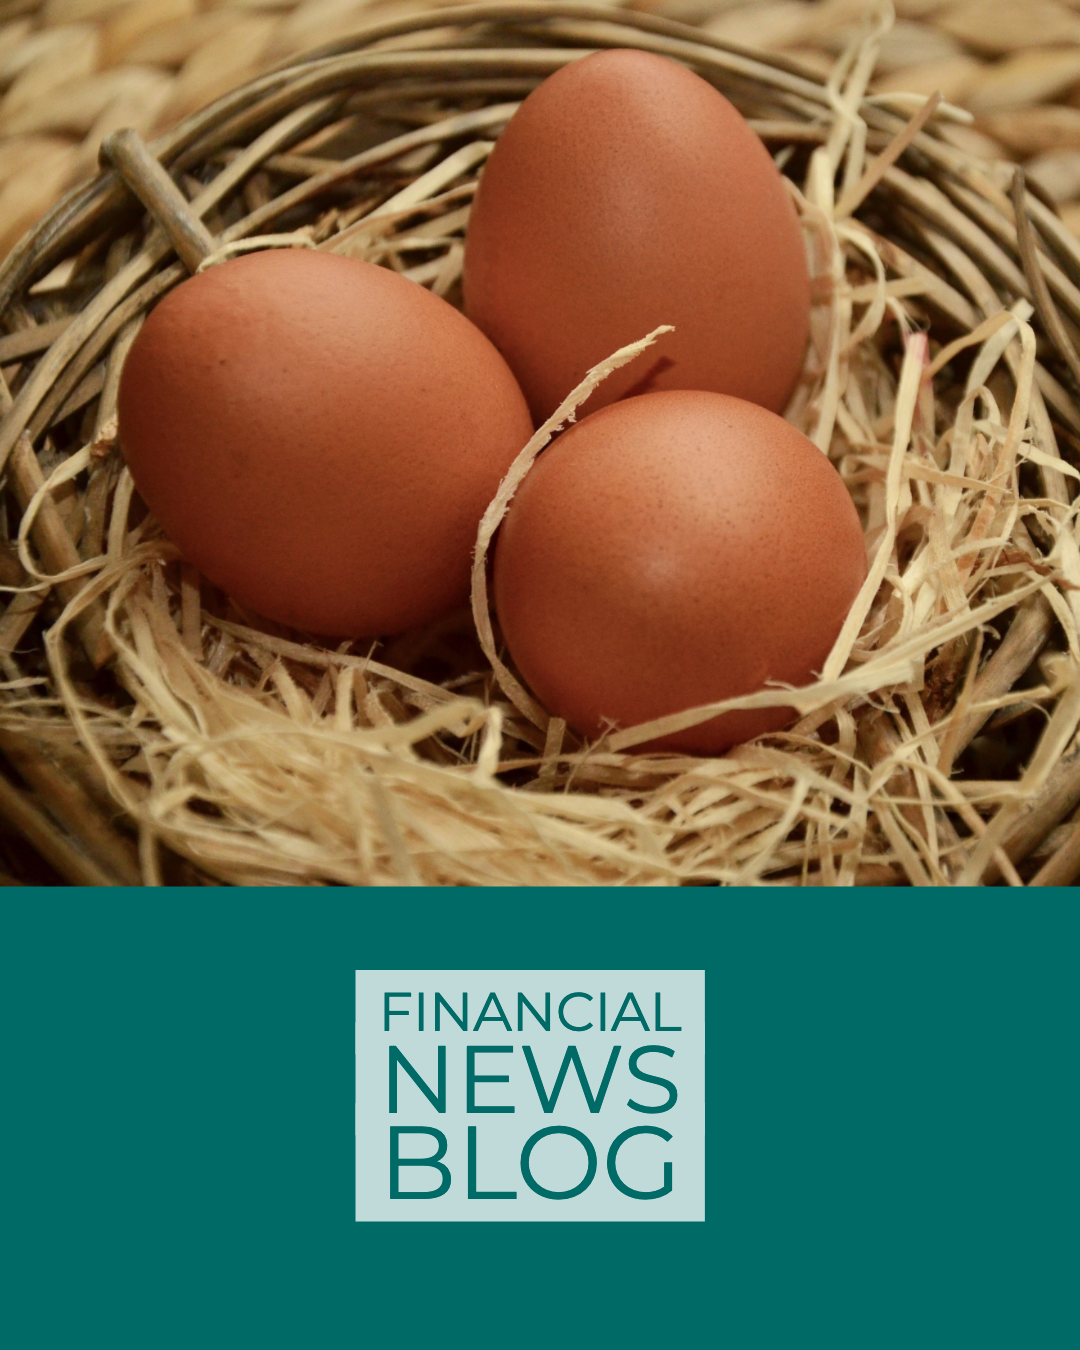 Financial News Blog.png